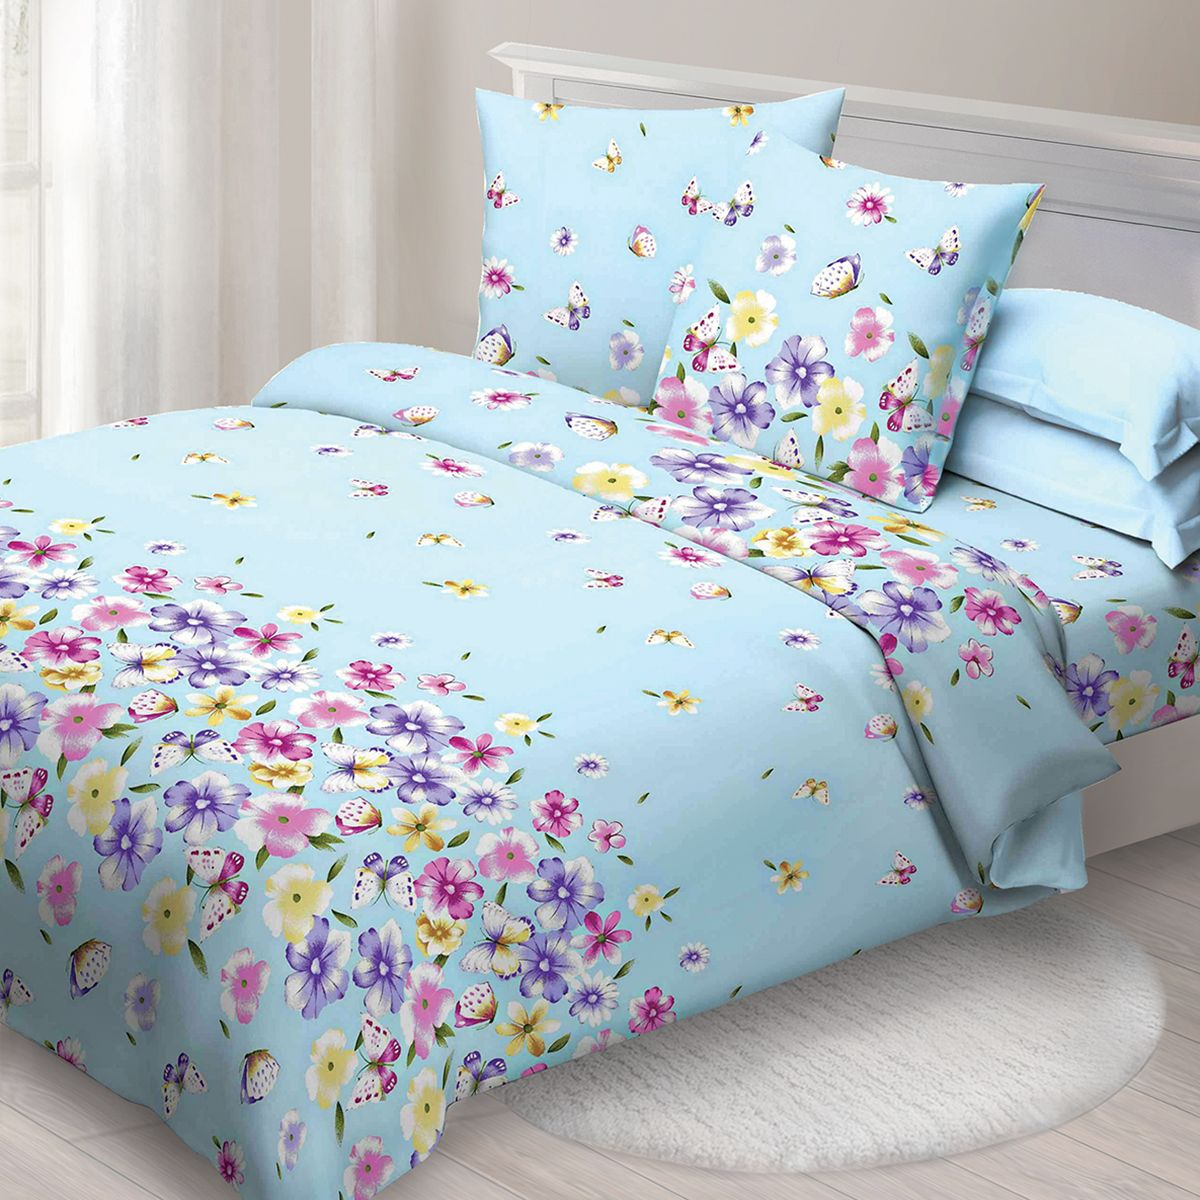 Комплект белья Спал Спалыч Летний день, 2-х спальное, наволочки 70x70, цвет: голубой. 1271-182459